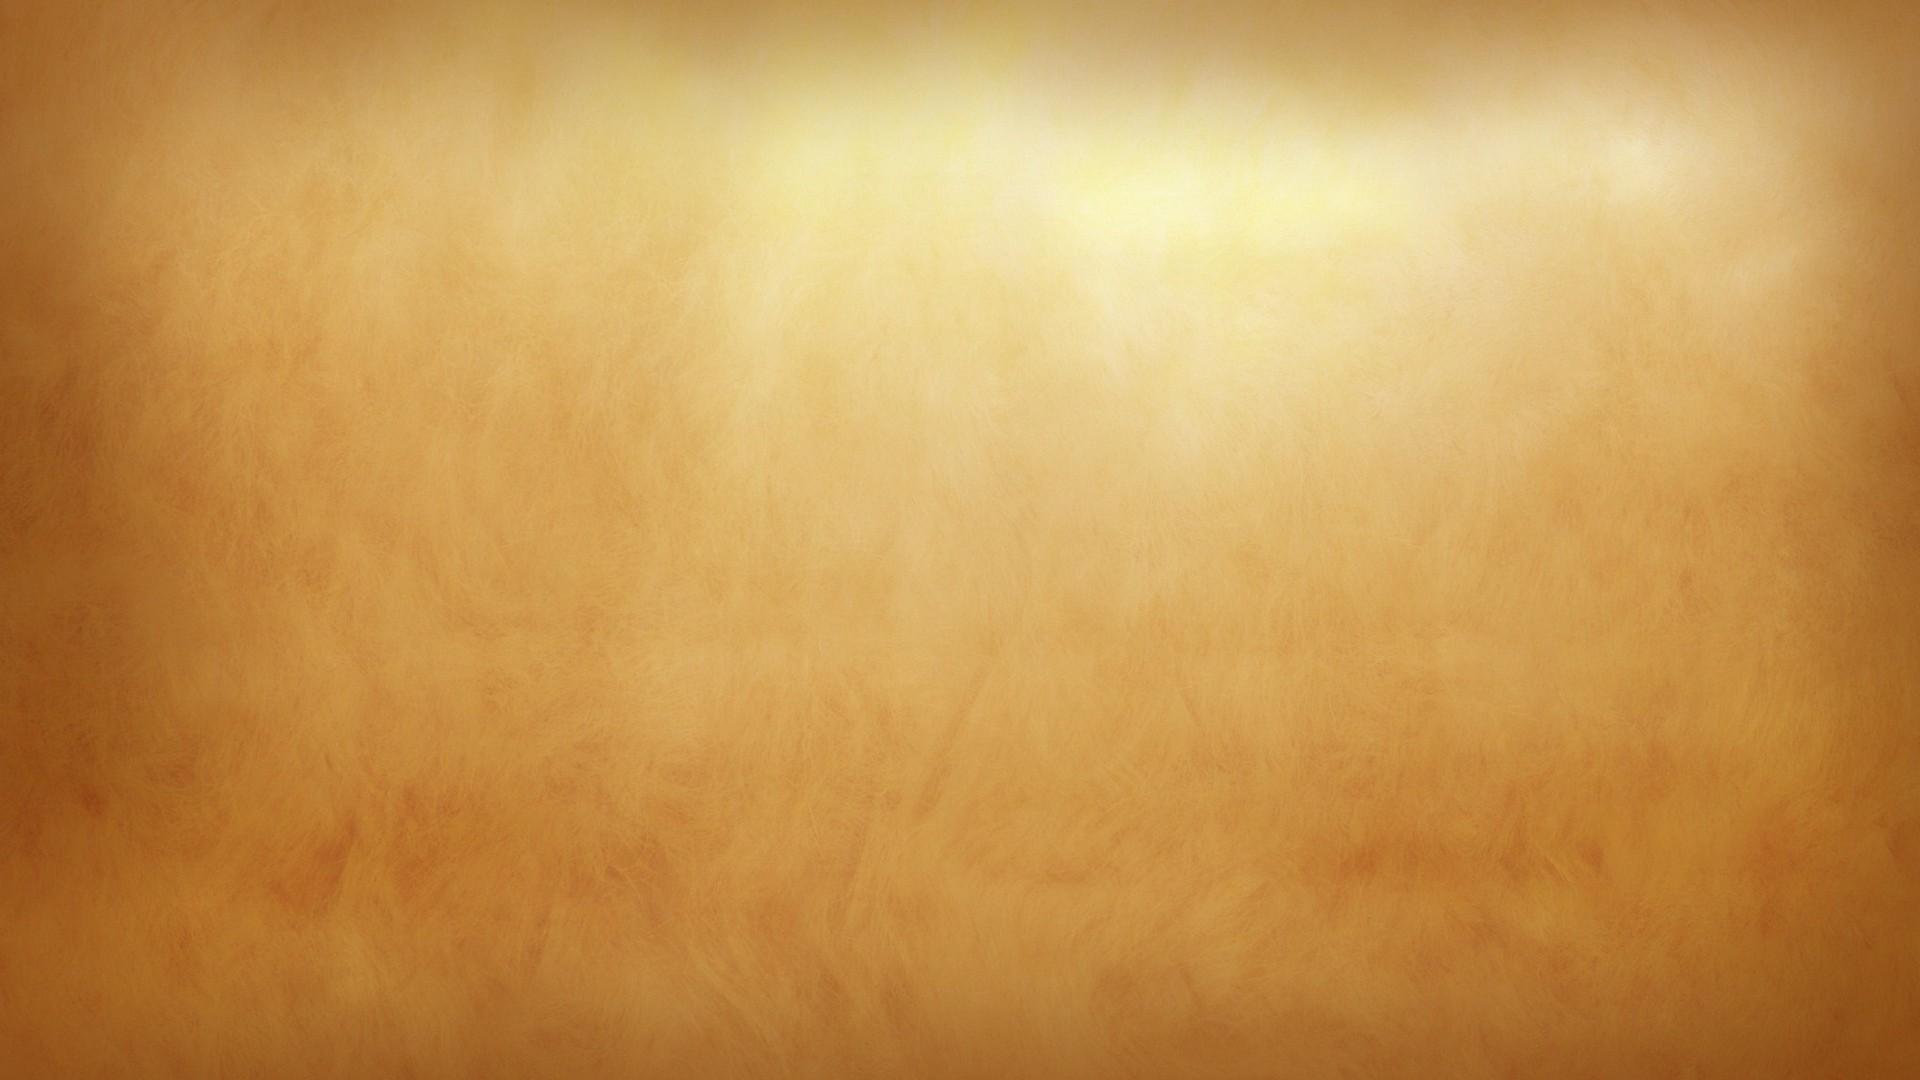 Wallpaper light, bright, background, texture, surface